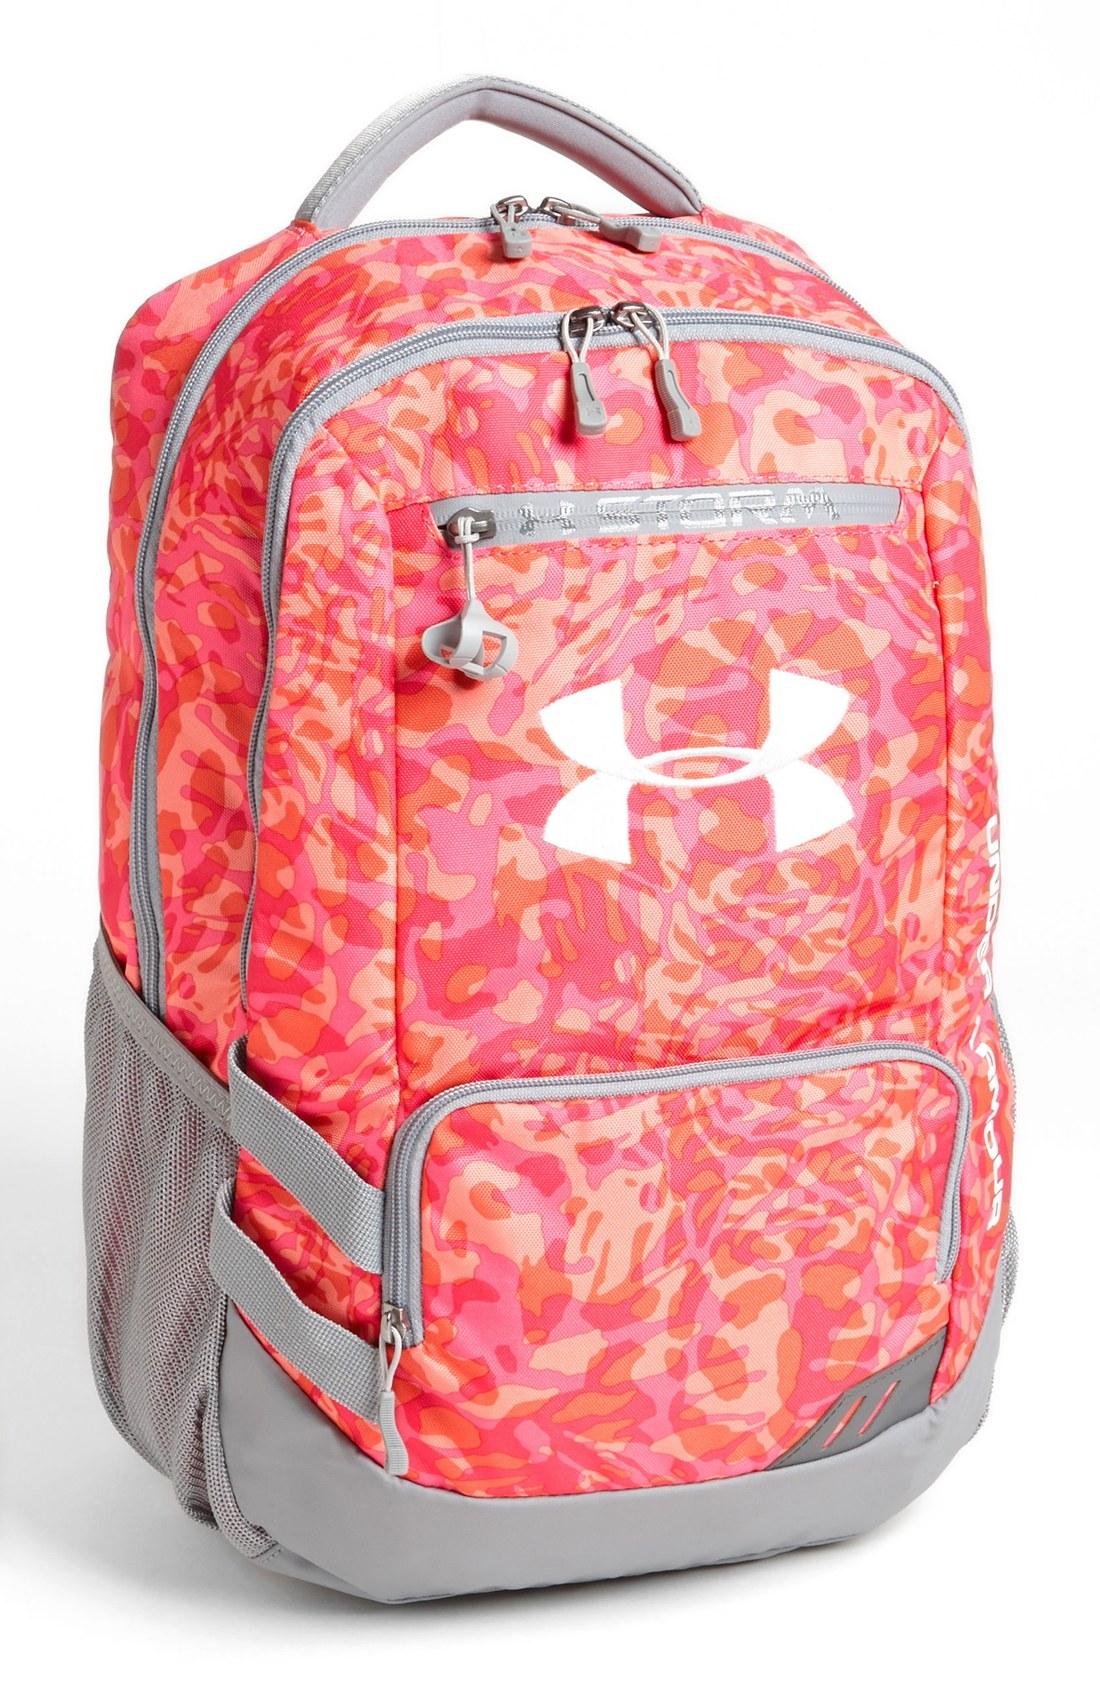 under armour hustle backpack in multicolor layer camo. Black Bedroom Furniture Sets. Home Design Ideas